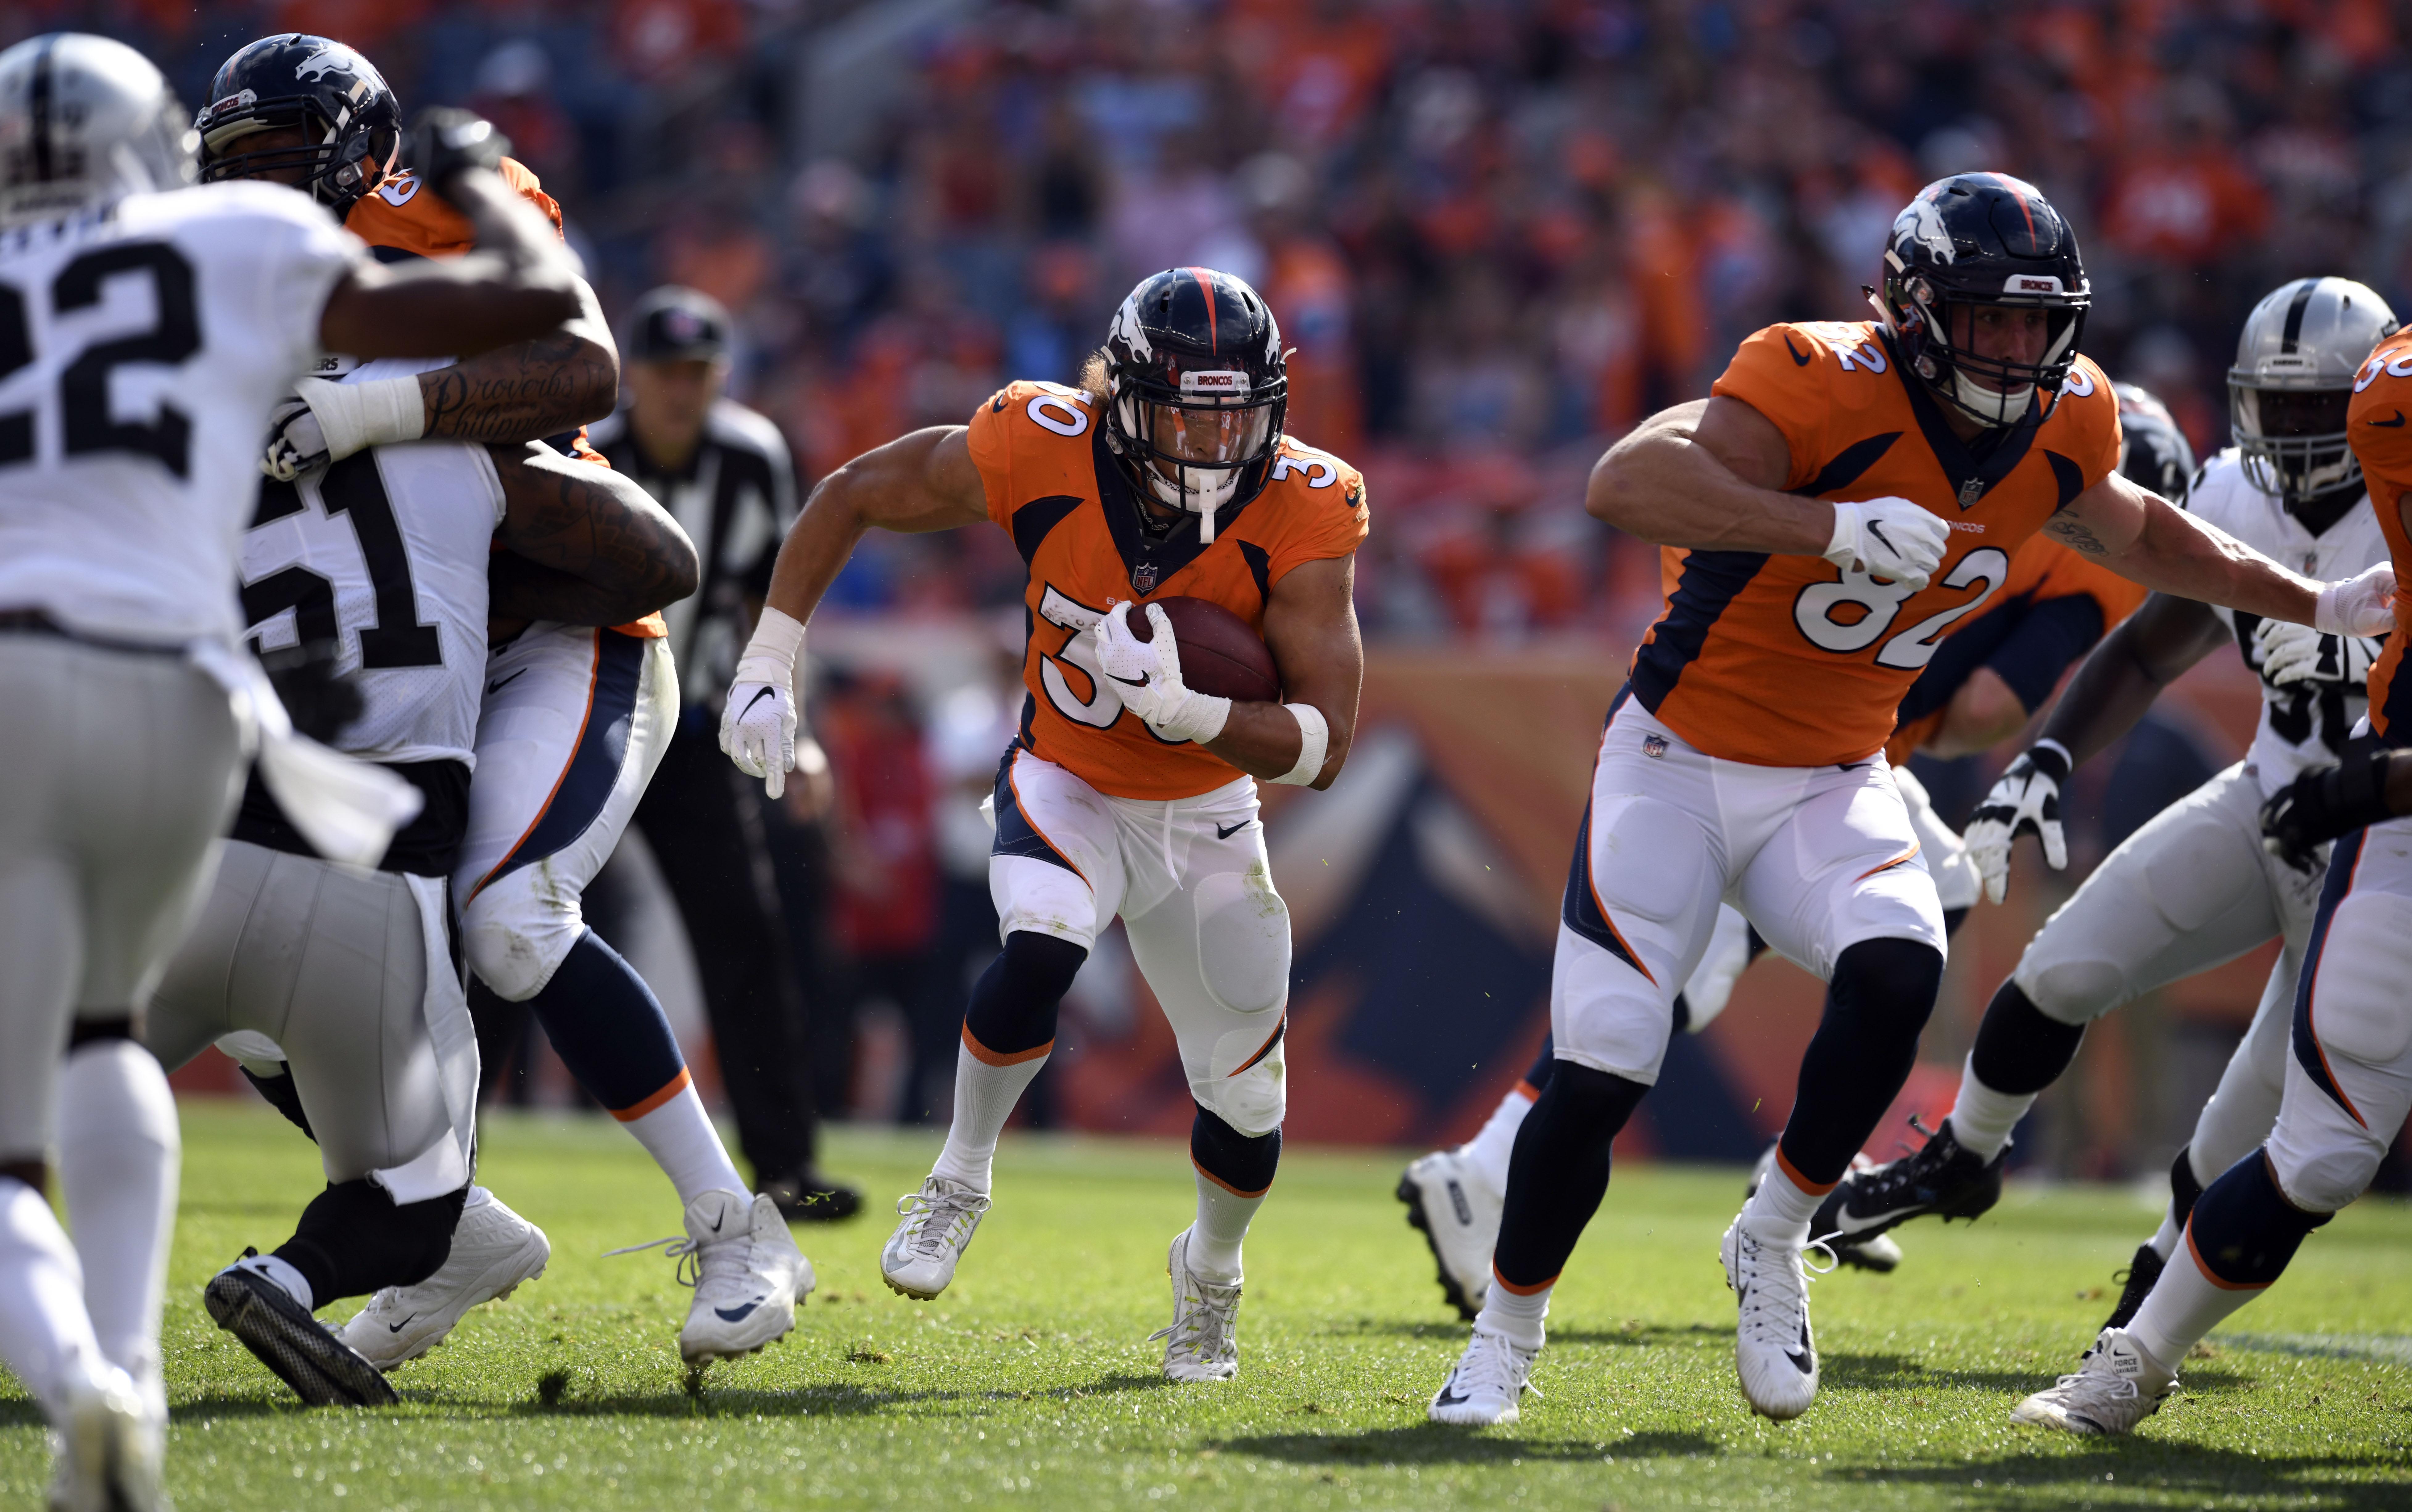 Broncos 2019 Schedule Announced. Denver Opens, Closes Season